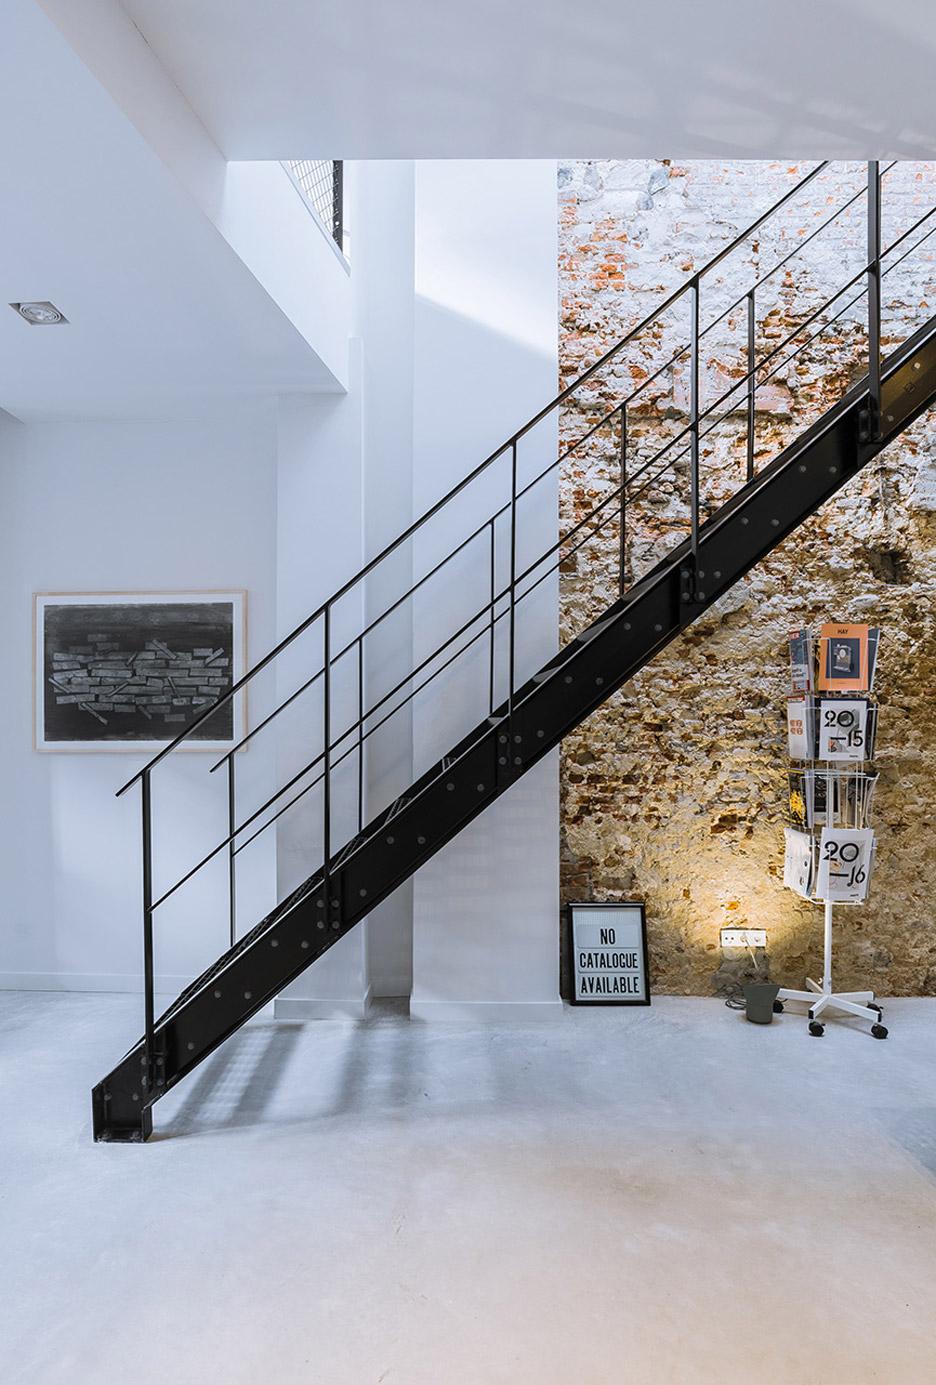 architecture_loft_design_studia_interiors_osnovadesign_osnova_poltava_12